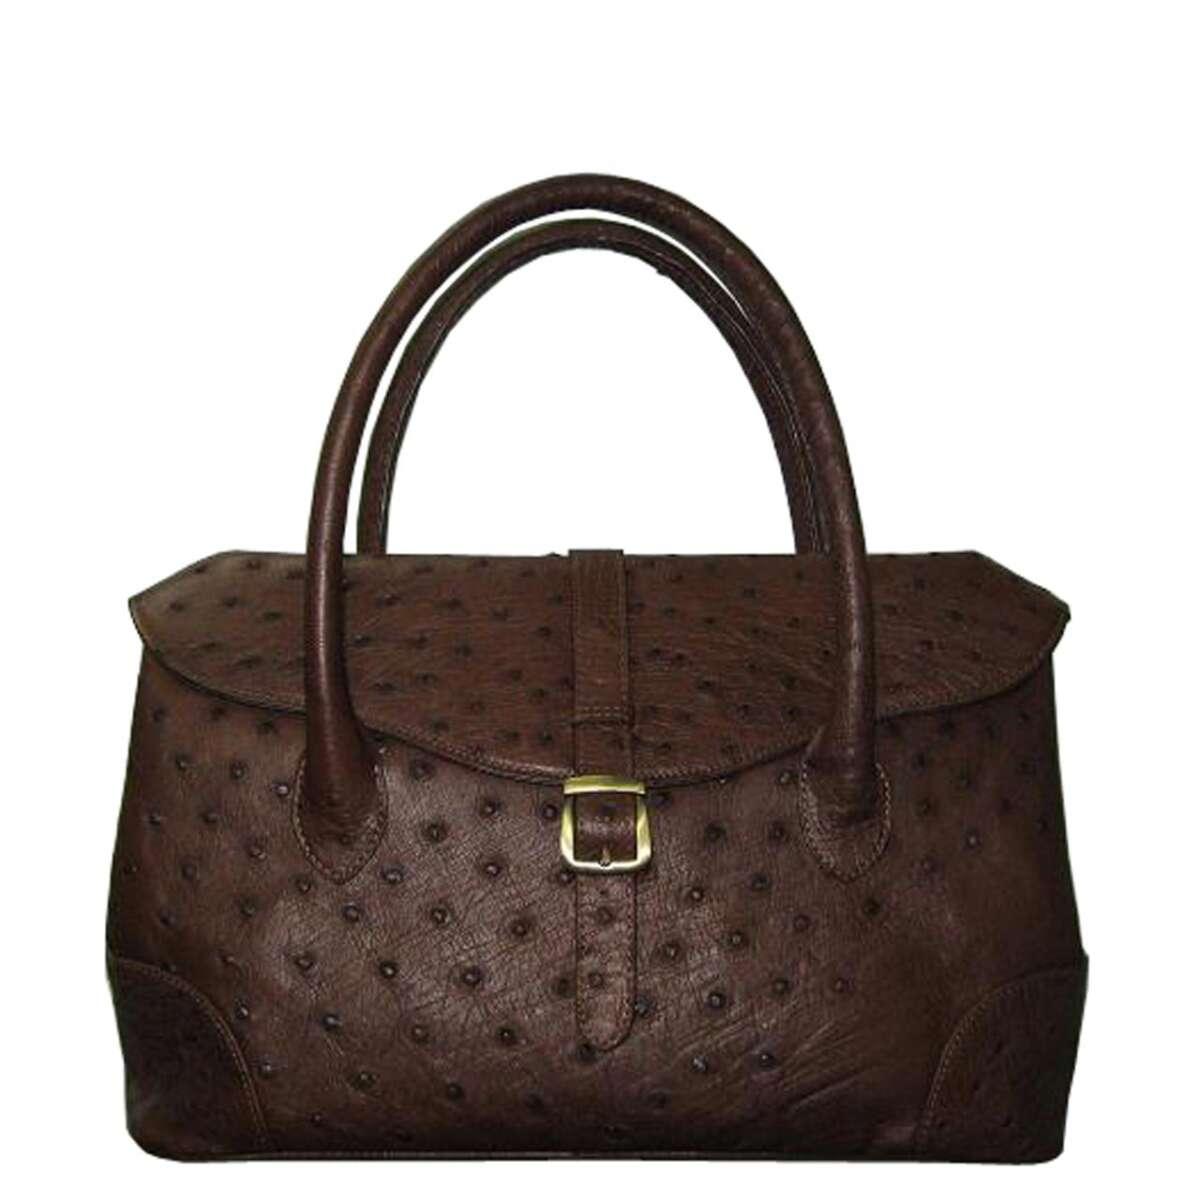 Túi xách nữ da đà điểu E004